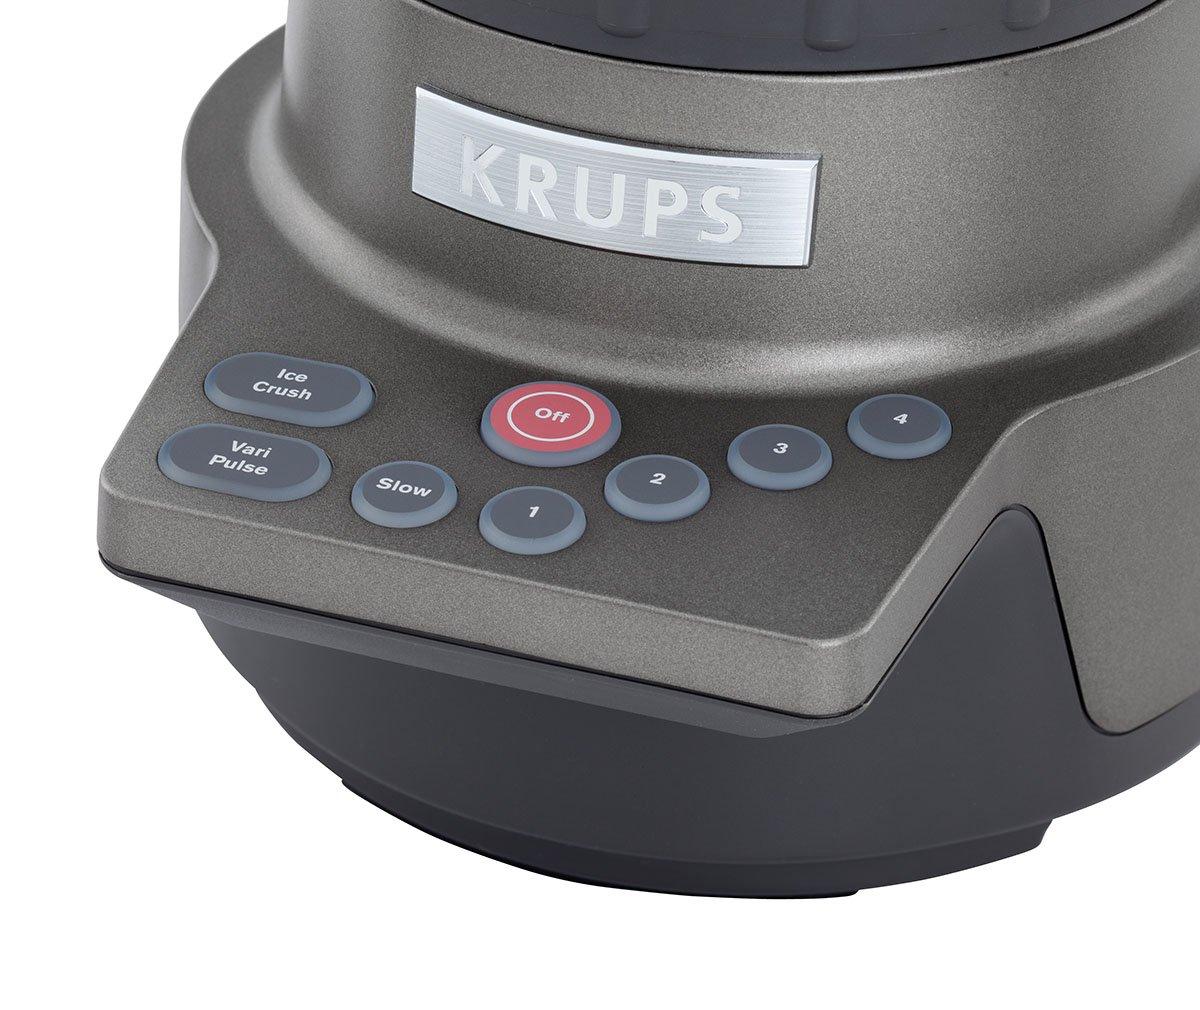 Amazon.com: Krups kb790 Motor Technik Licuadora con 6 ...